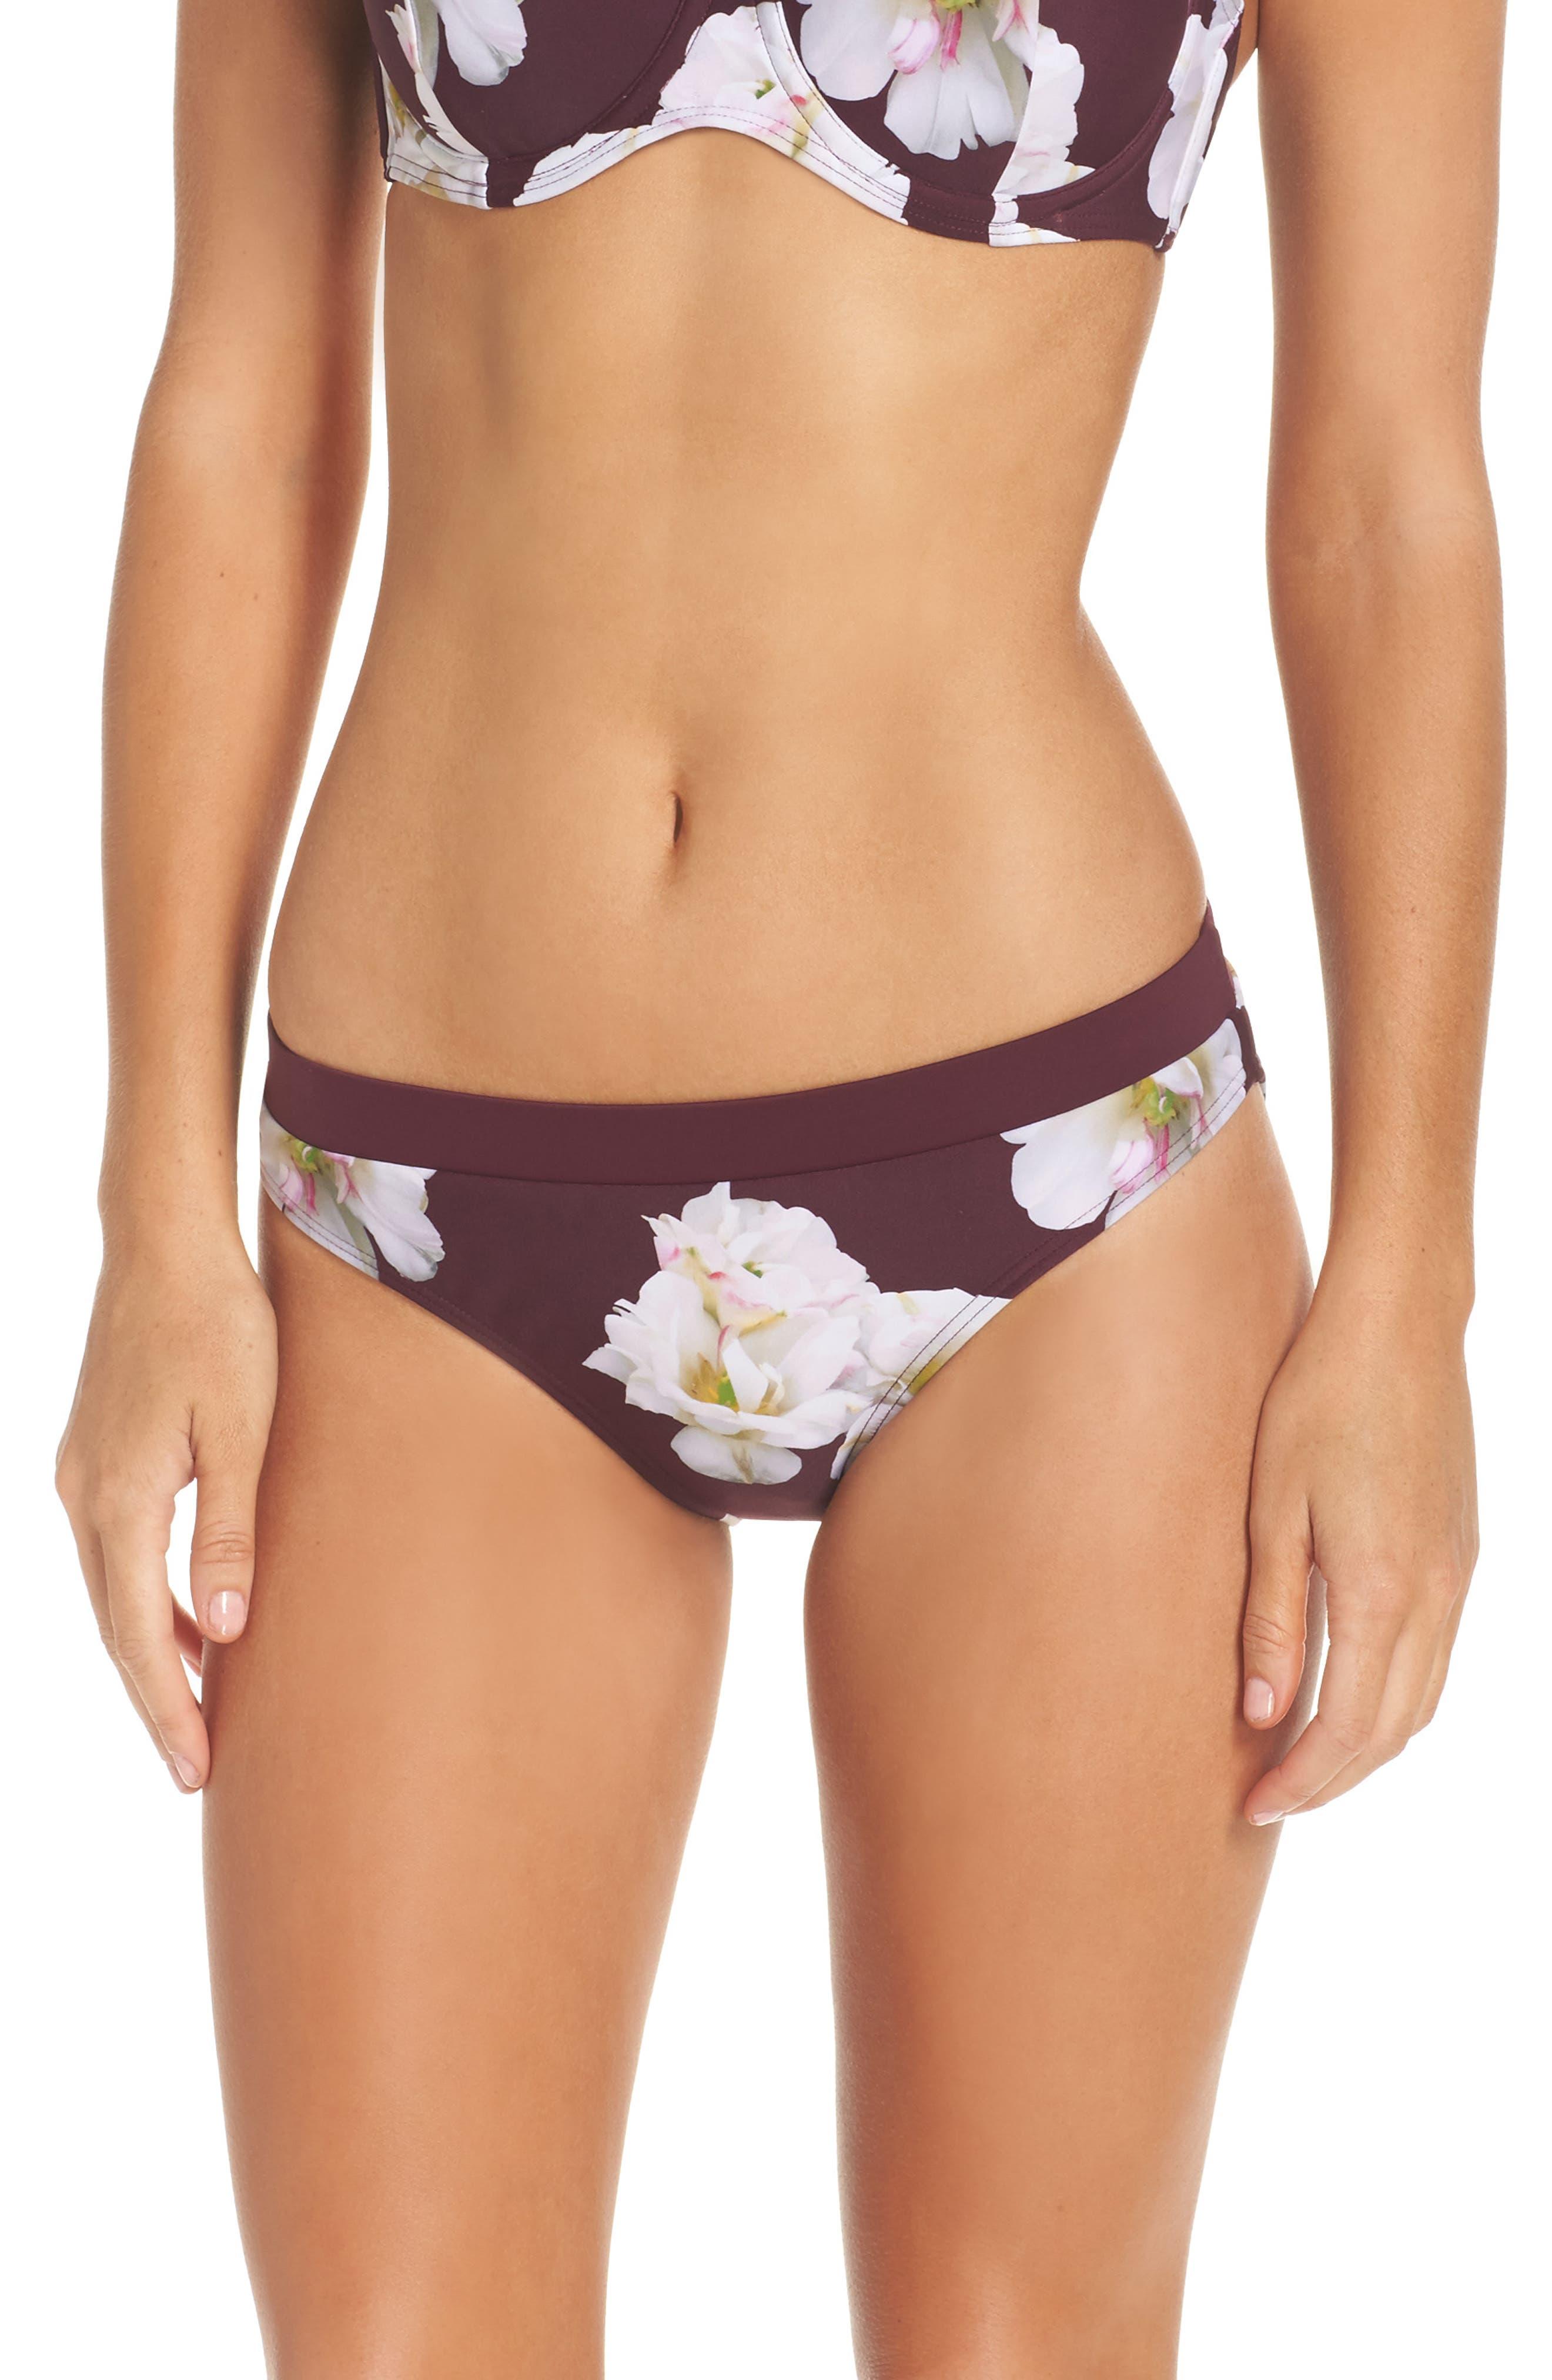 Garcela Gardenia Bikini Bottoms,                         Main,                         color, 930